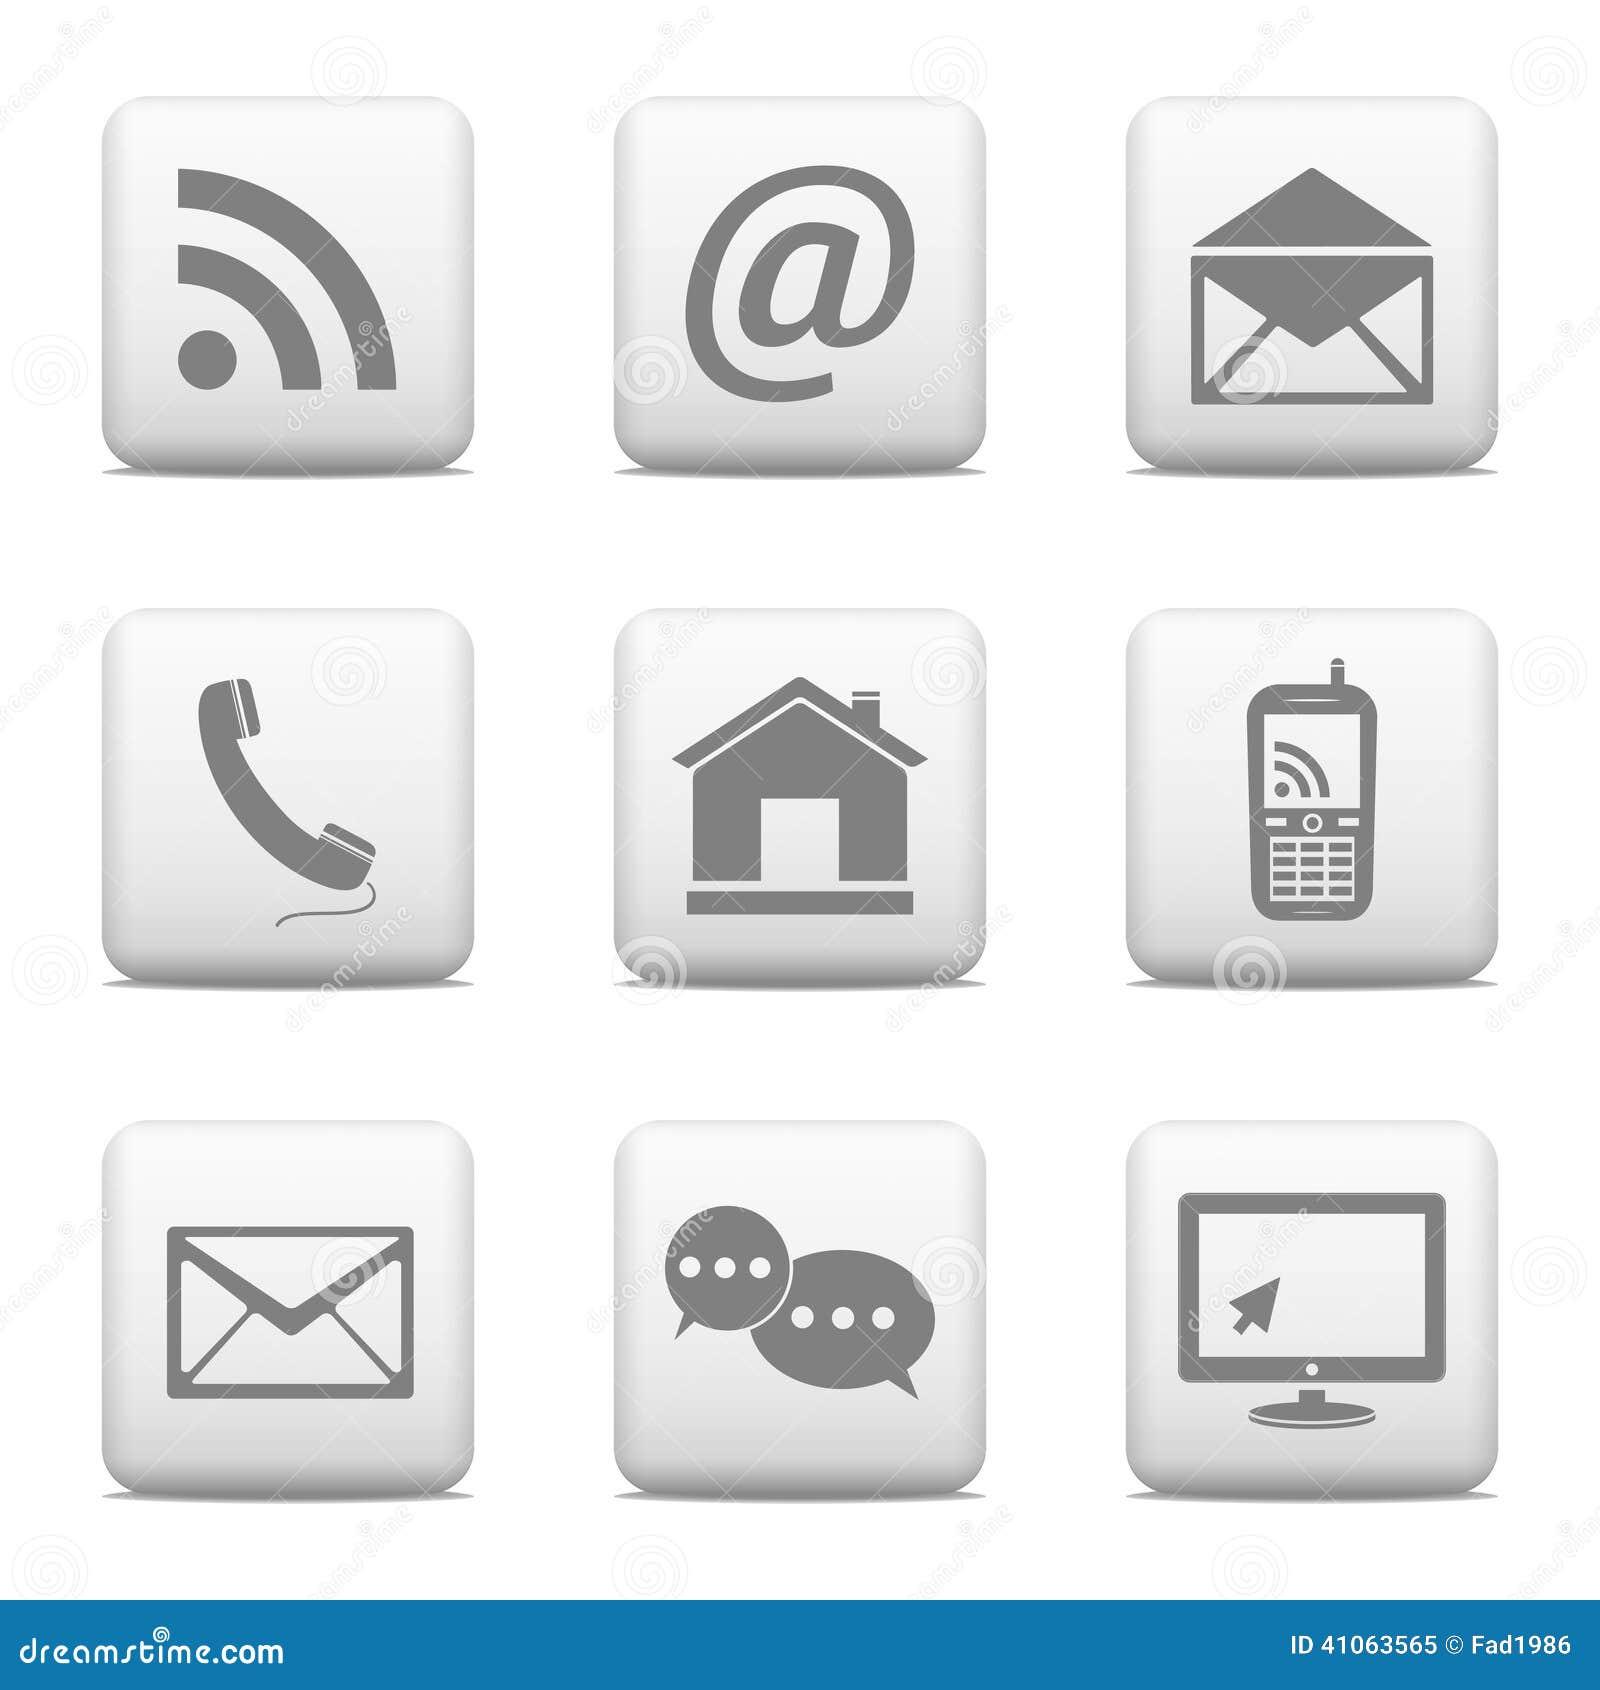 Kontaktknöpfe eingestellt, E-Mail-Ikonen